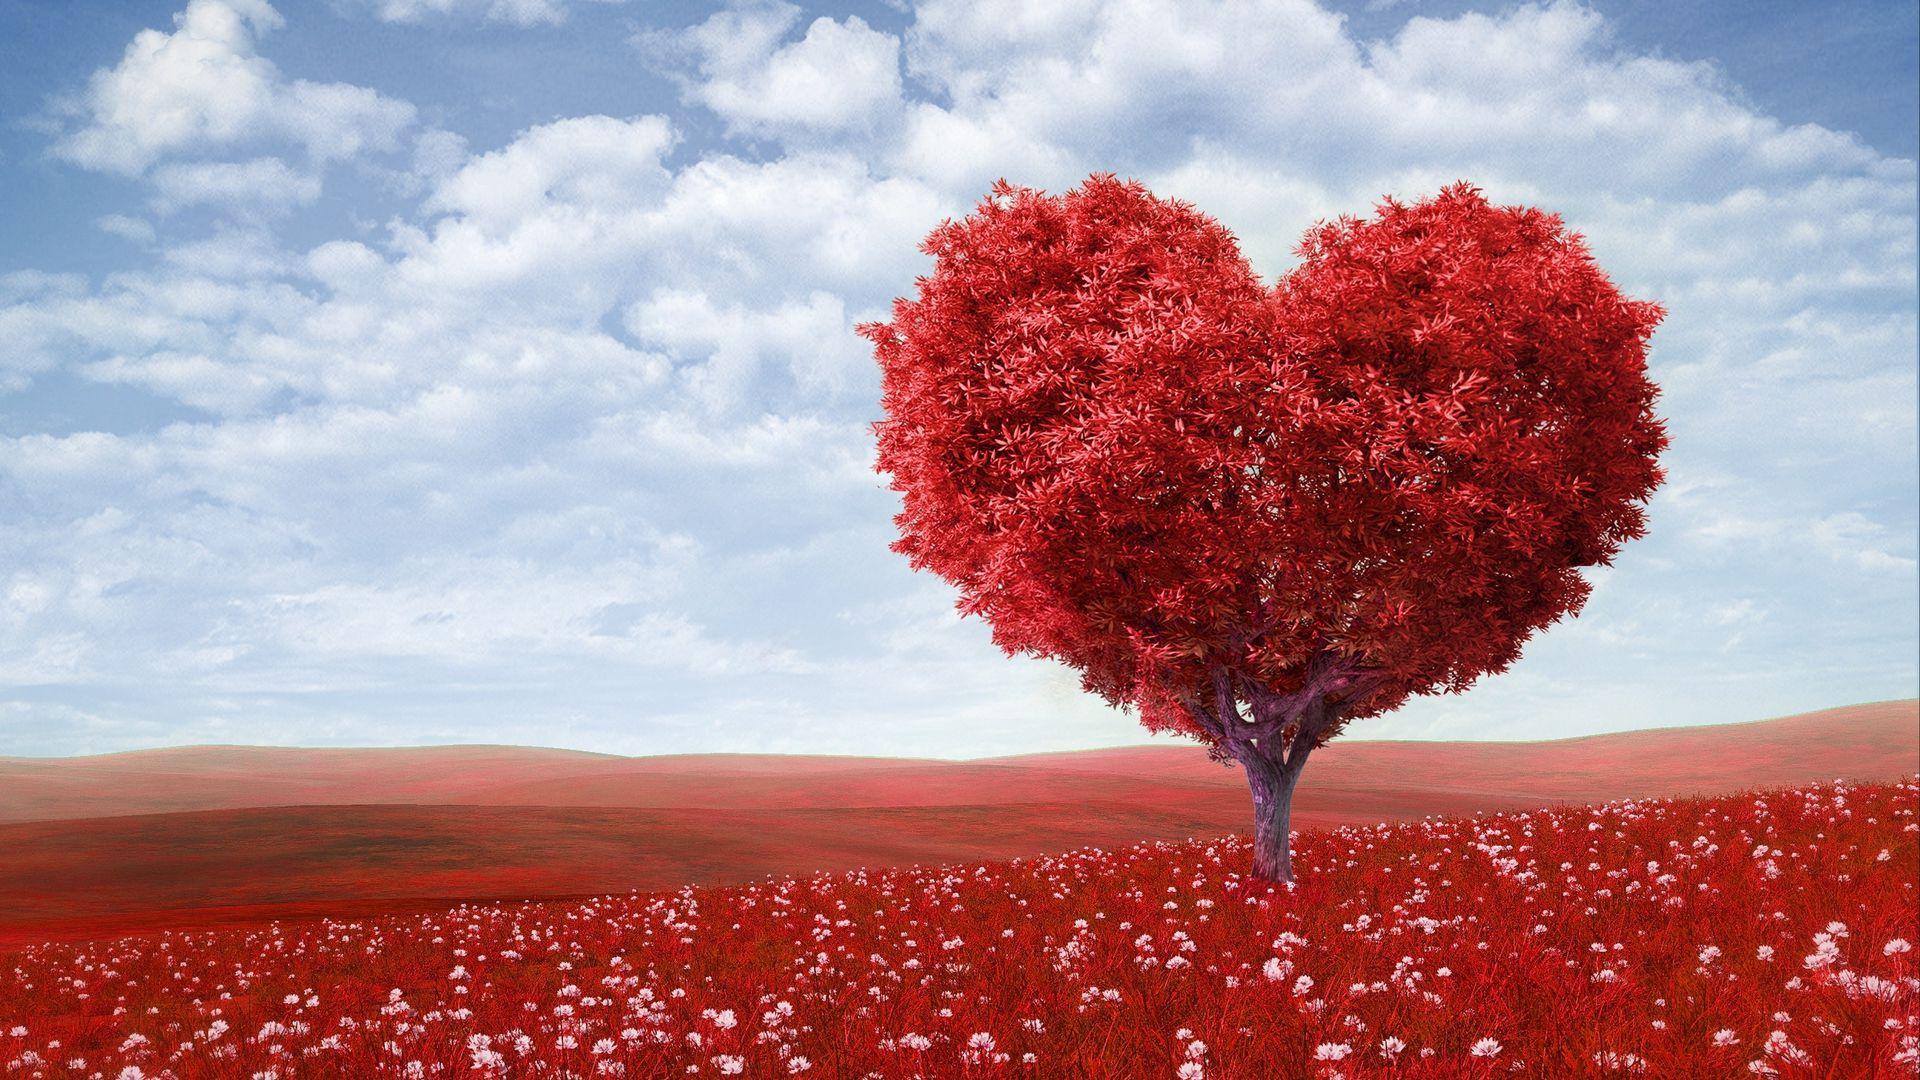 1920x1080 Wallpaper tree, heart, photoshop, field, grass, romance